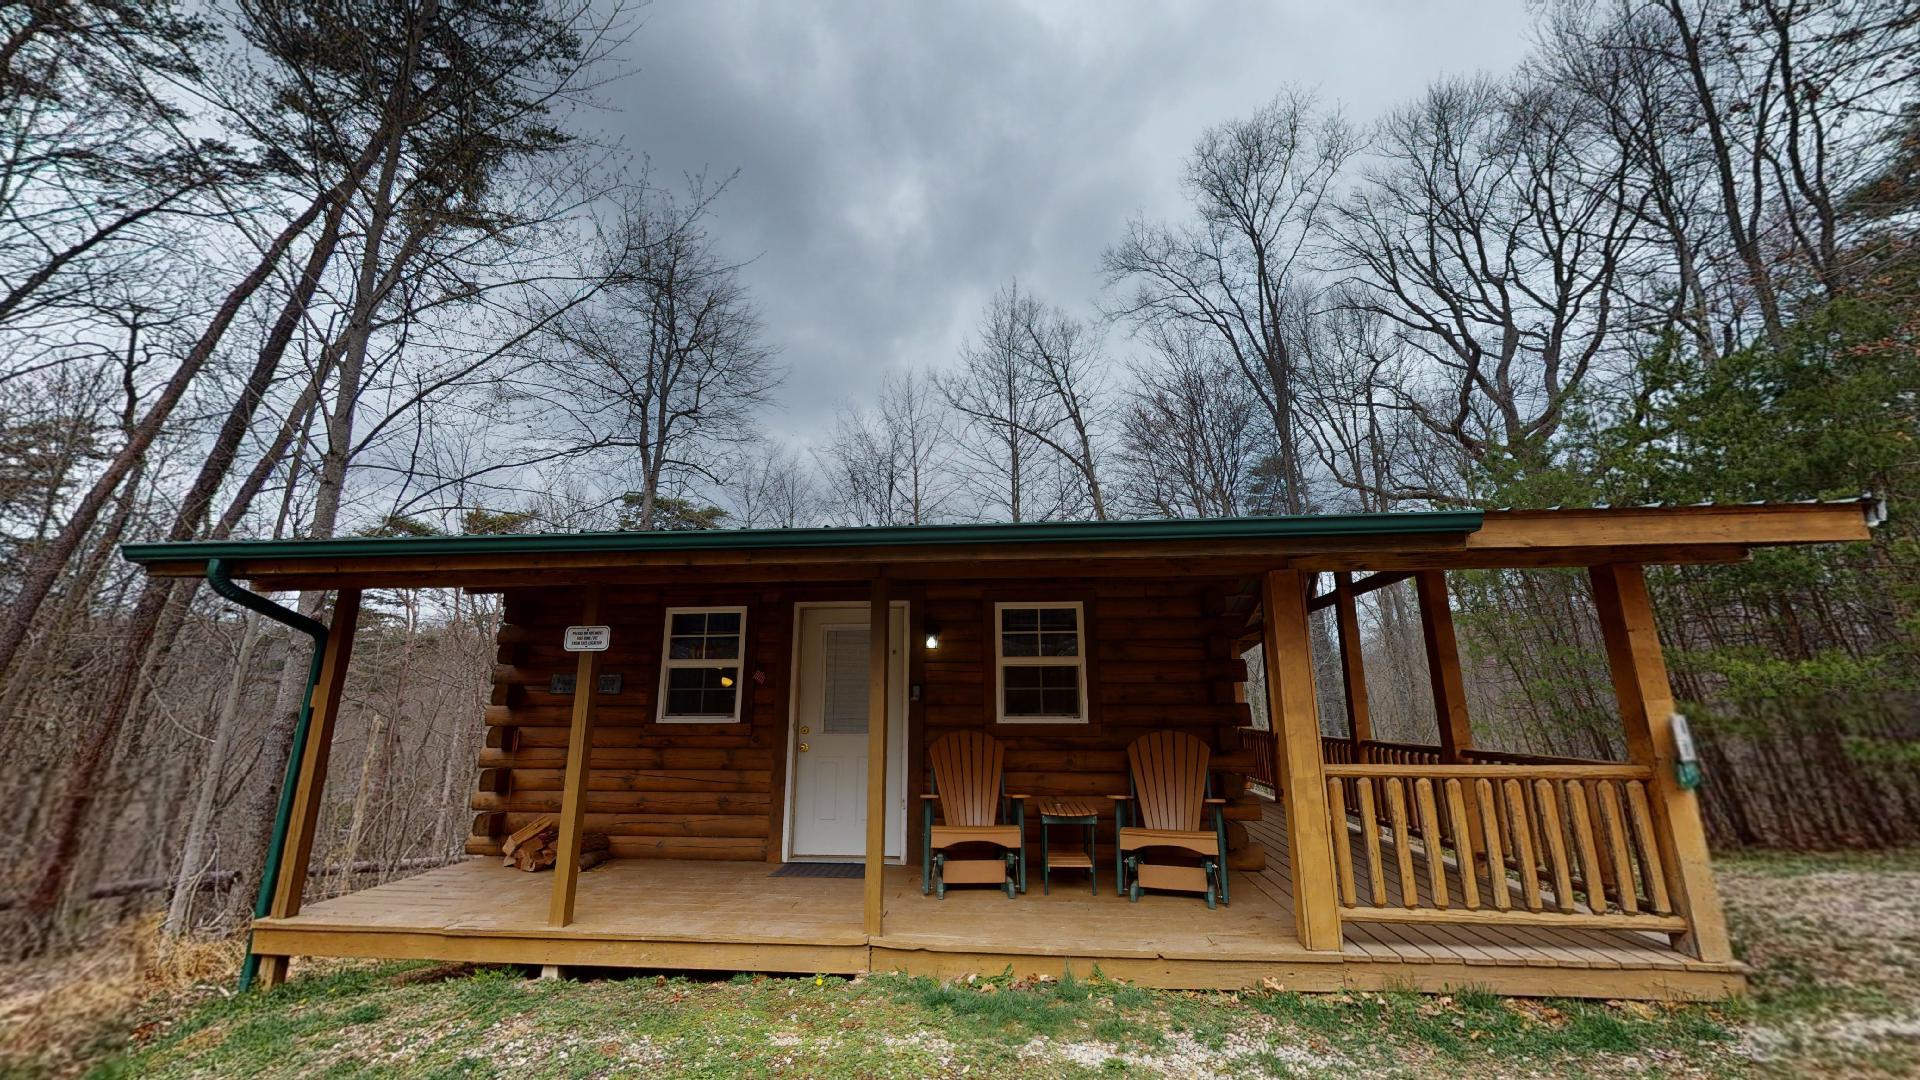 Photo 663_9190.jpg - Pet friendly under 30 lbs couples cabin.